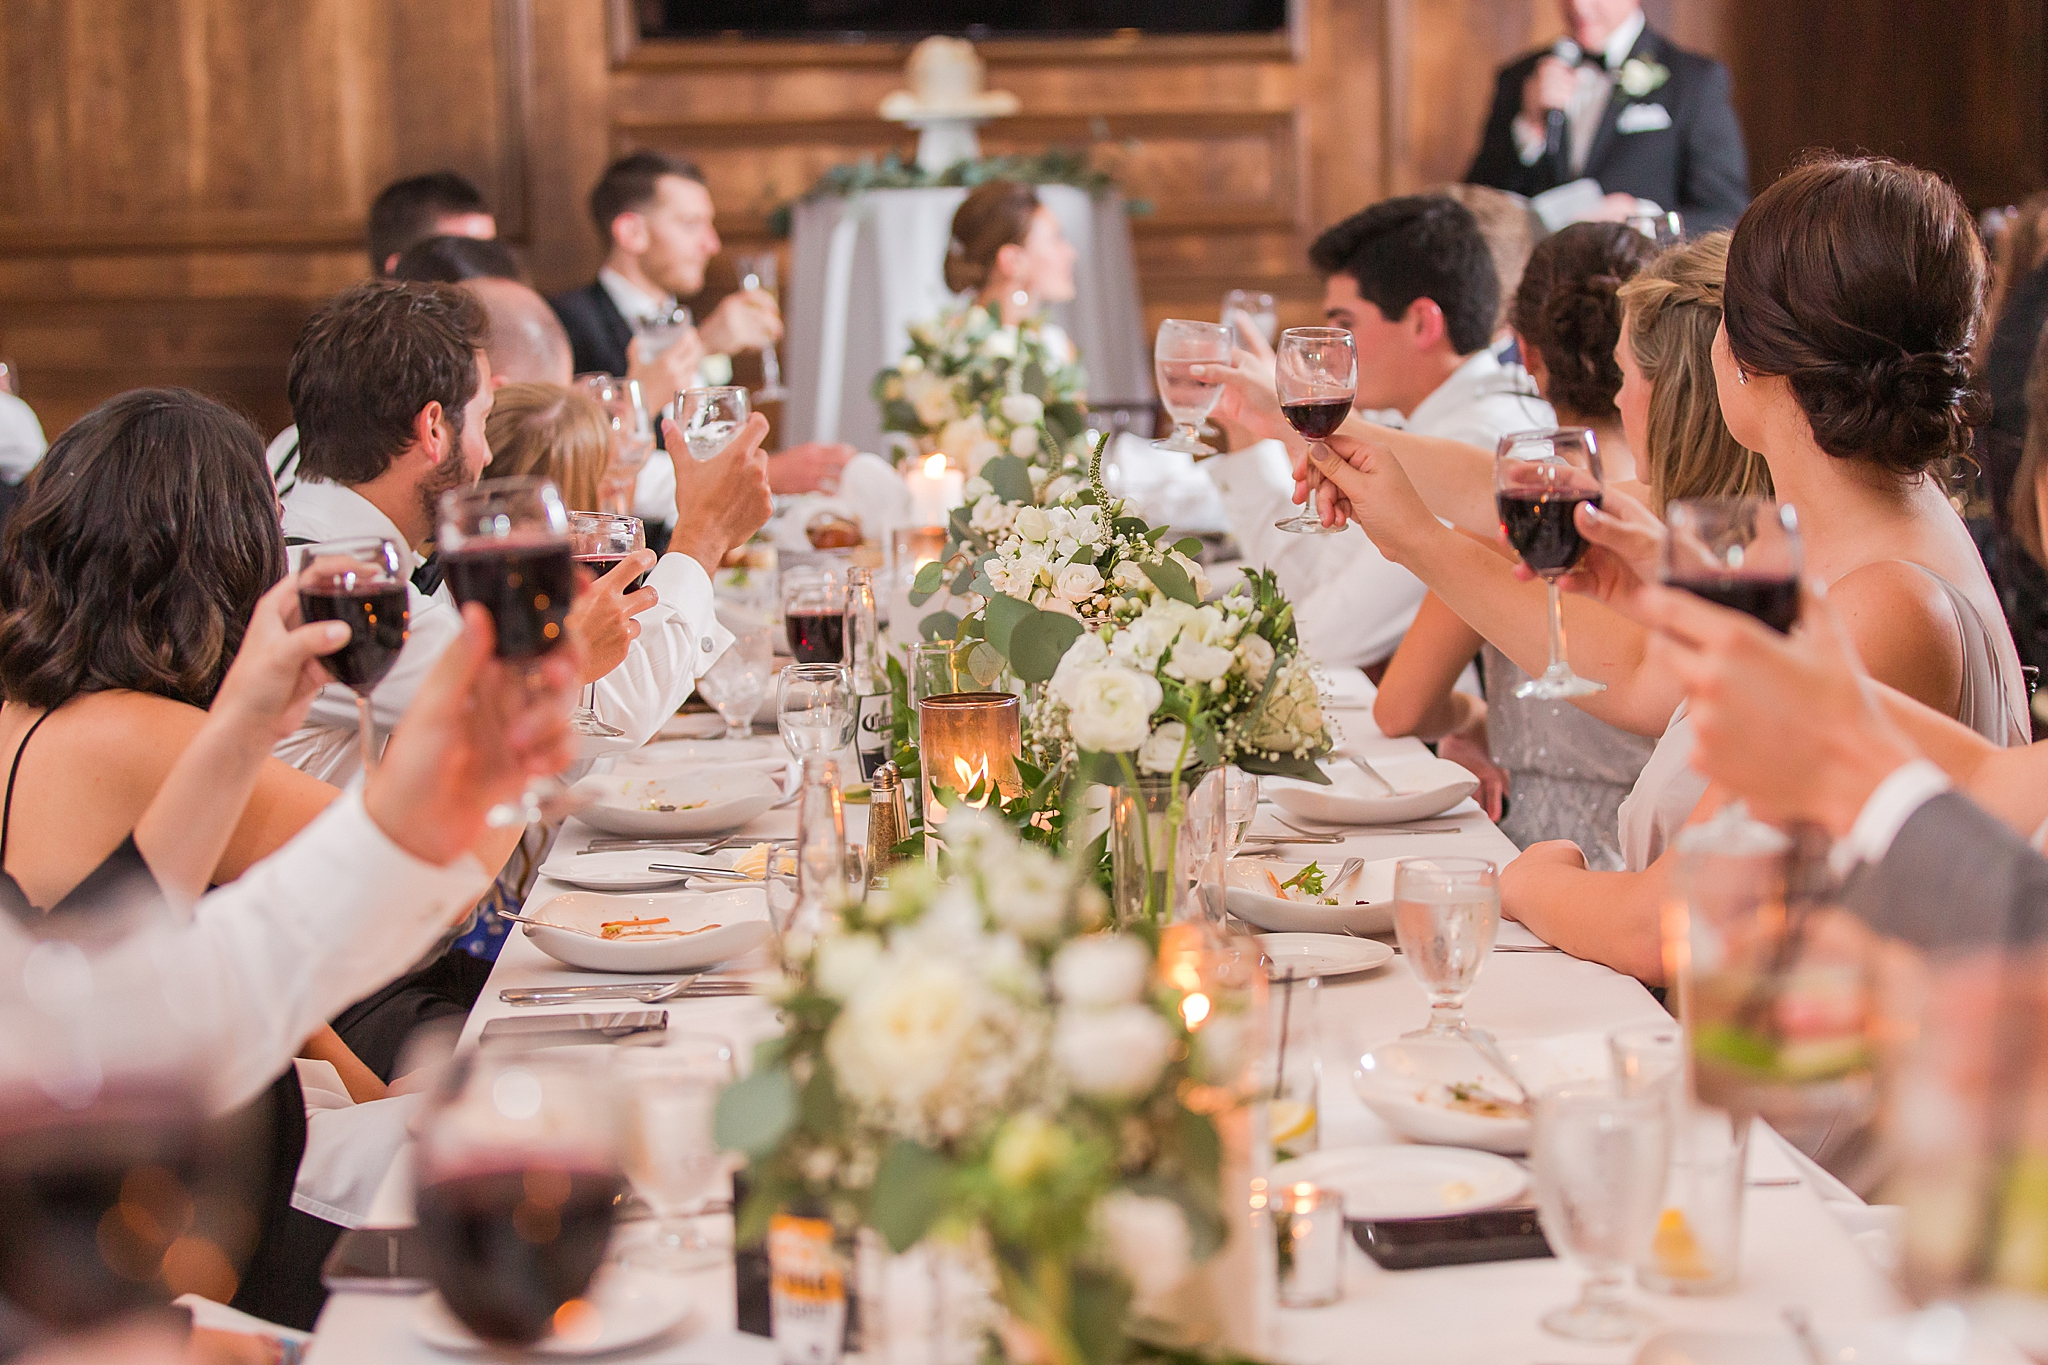 detroit-wedding-photographer-grosse-pointe-academy-chapel-detroit-golf-club-wedding-carly-matt-by-courtney-carolyn-photography_0098.jpg